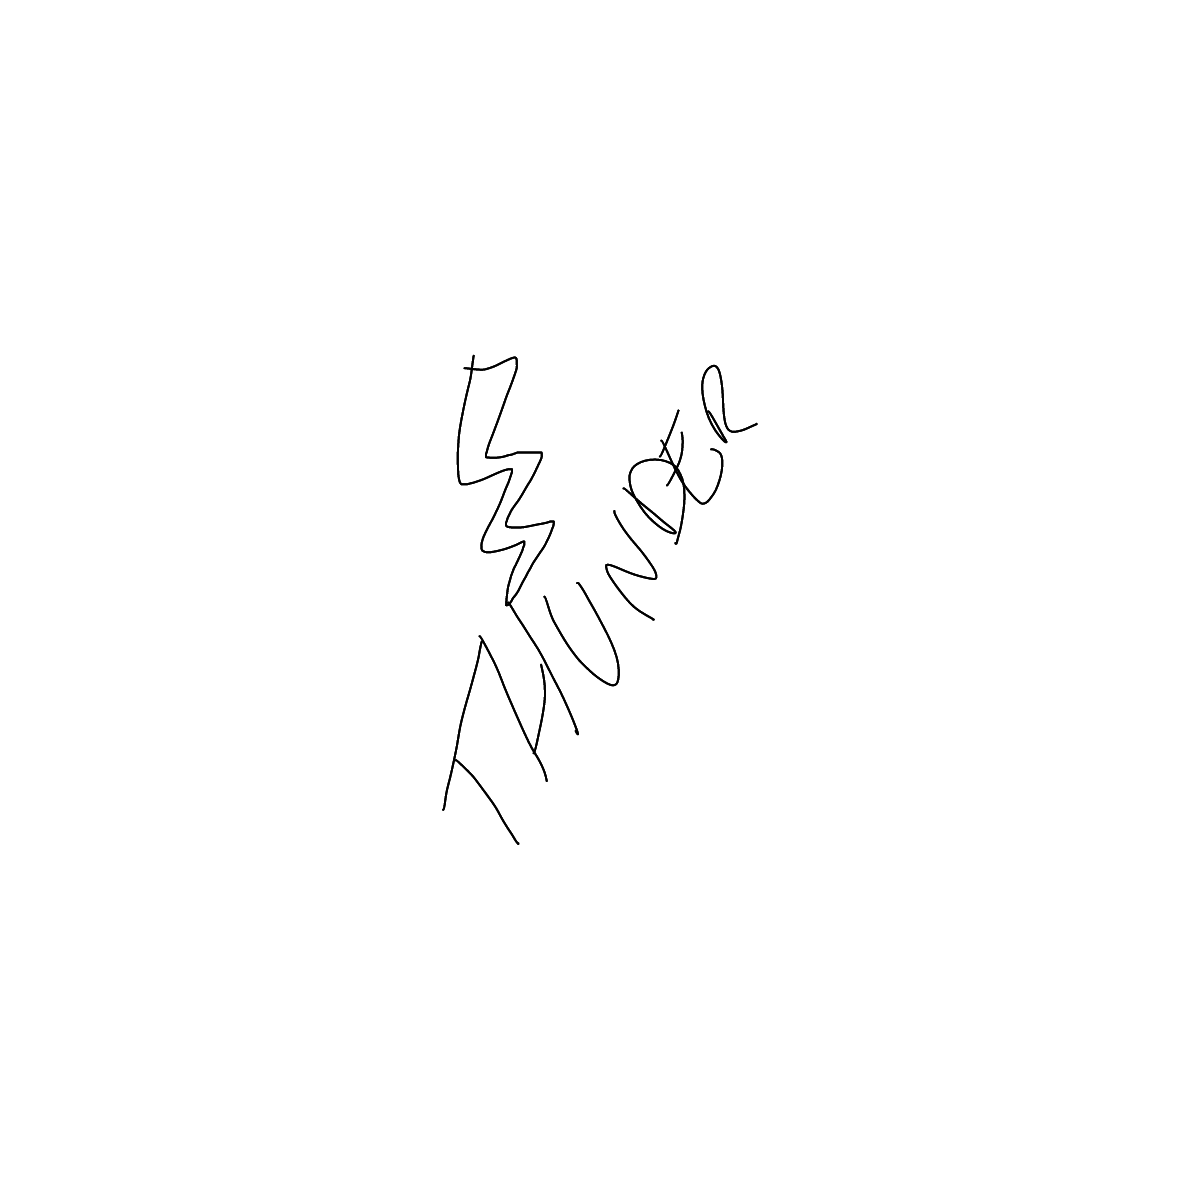 BAAAM drawing#18171 lat:50.8462181091308600lng: 0.4322063326835632